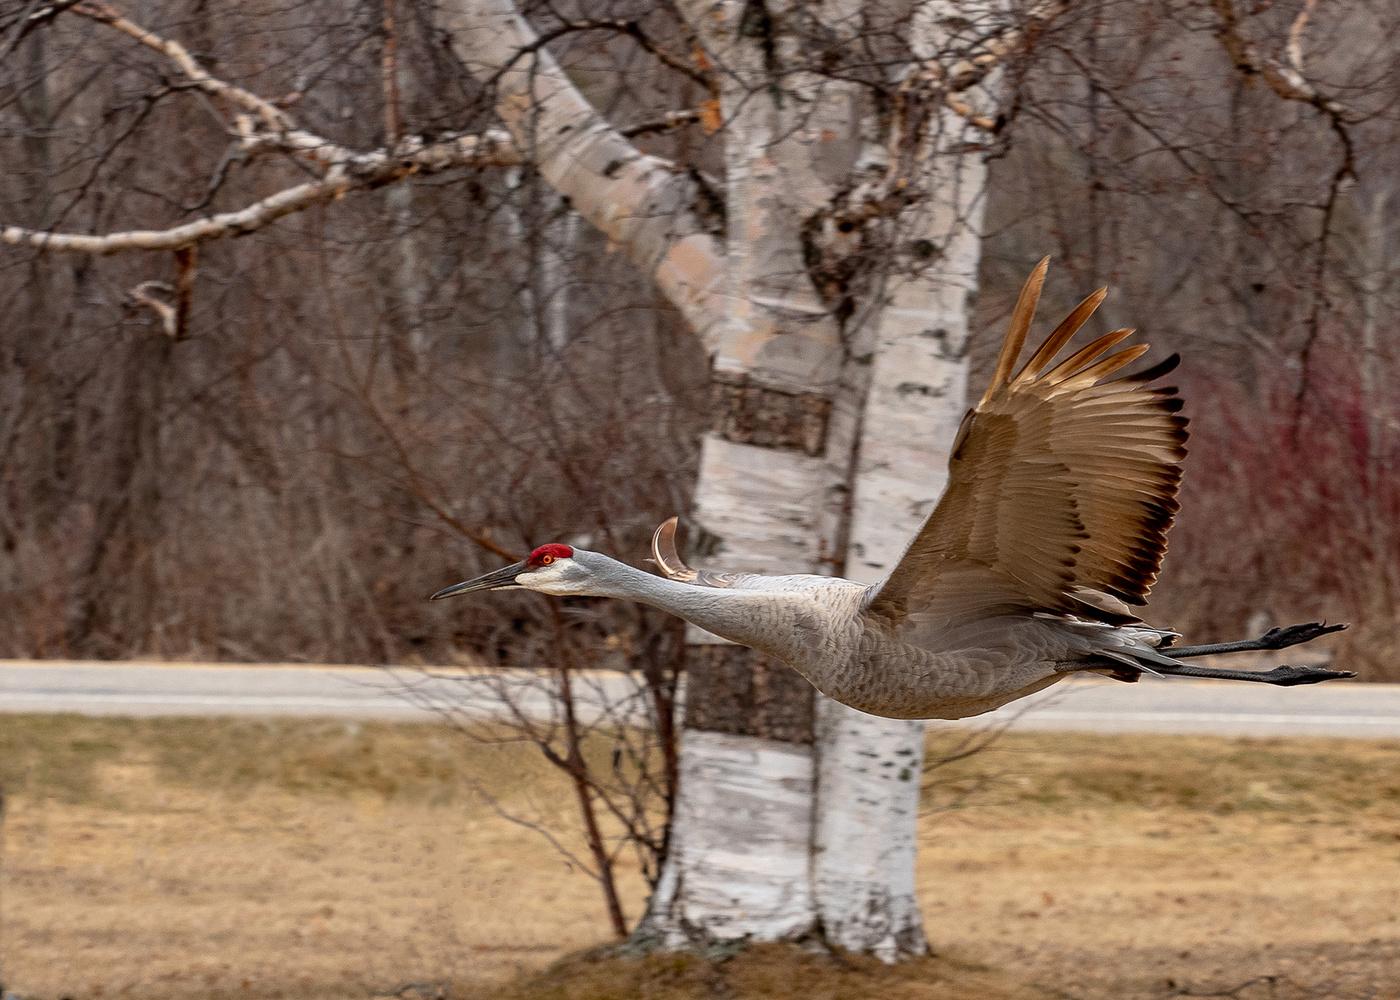 Flight of the Crane by Andy Marek